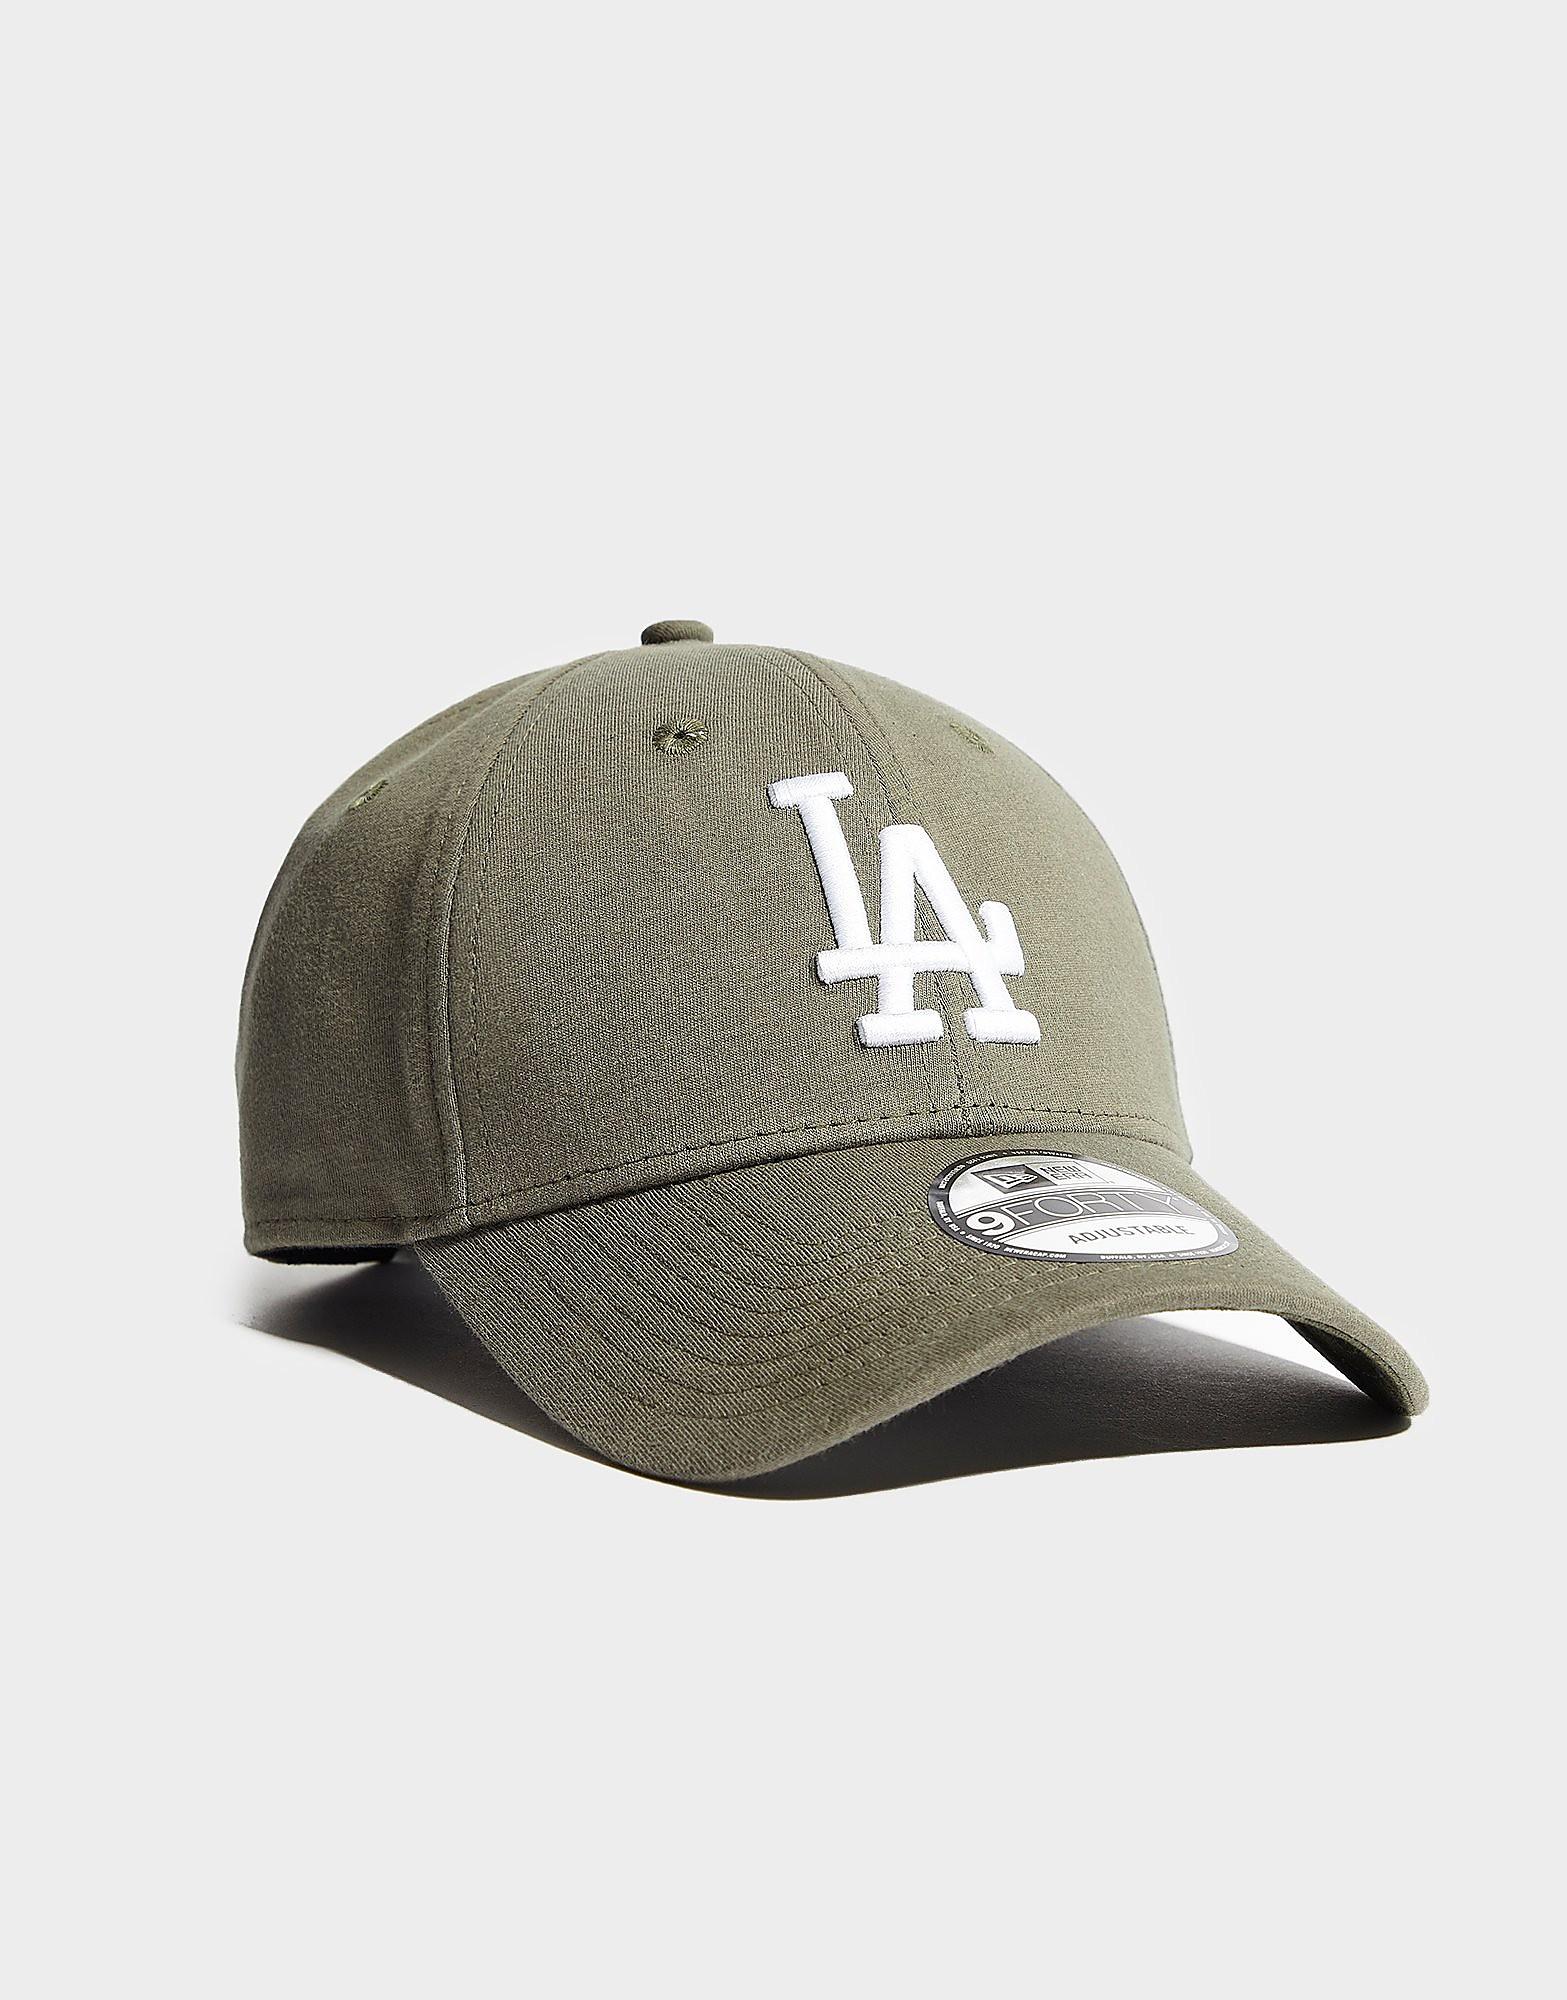 New Era MLB Los Angeles Dodgers 9FORTY Cap